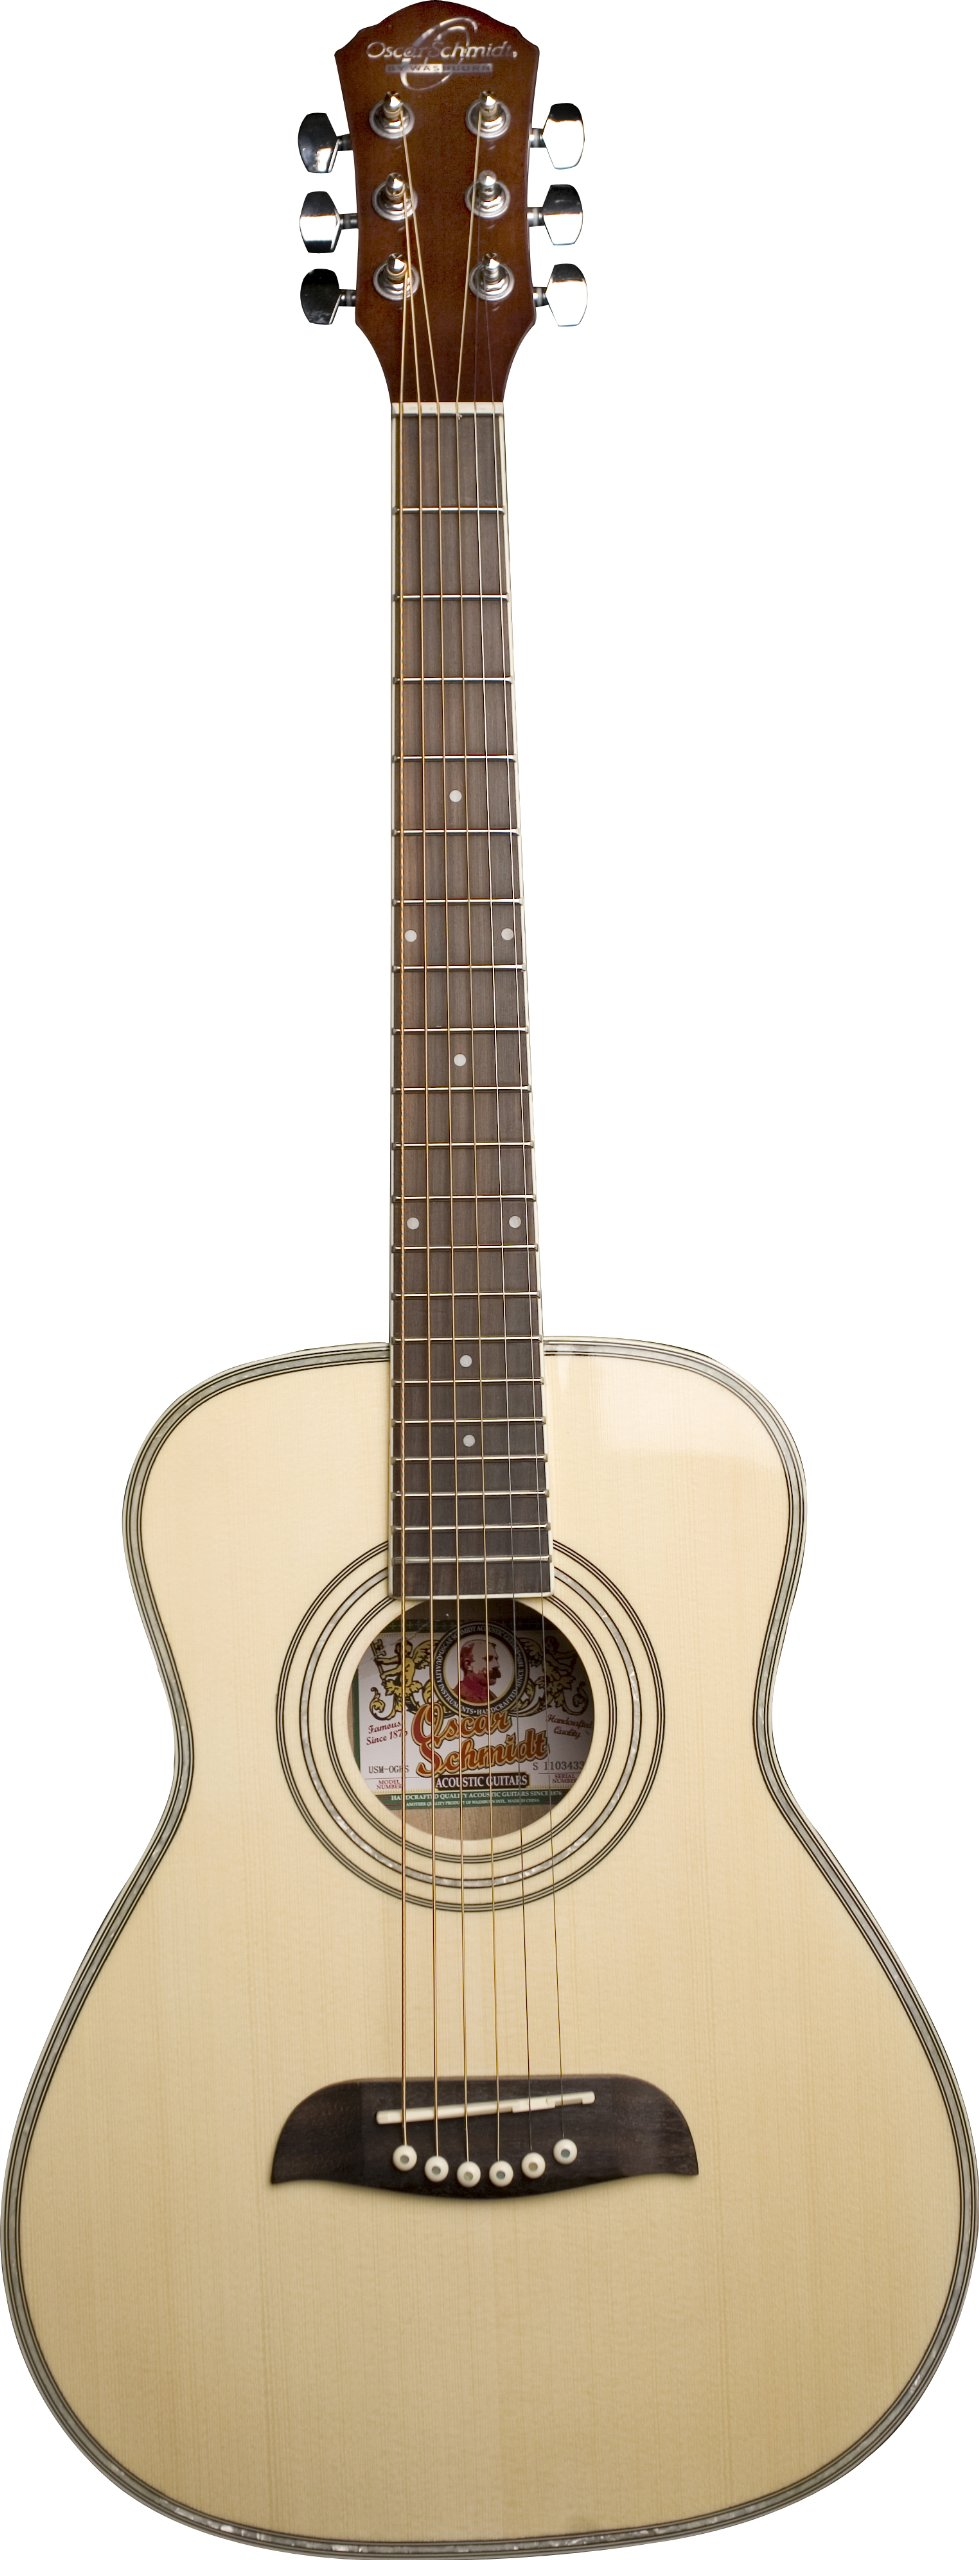 Oscar Schmidt OGHS-A-U 1/2 Size Dreadnought Acoustic Guitar (High Gloss)